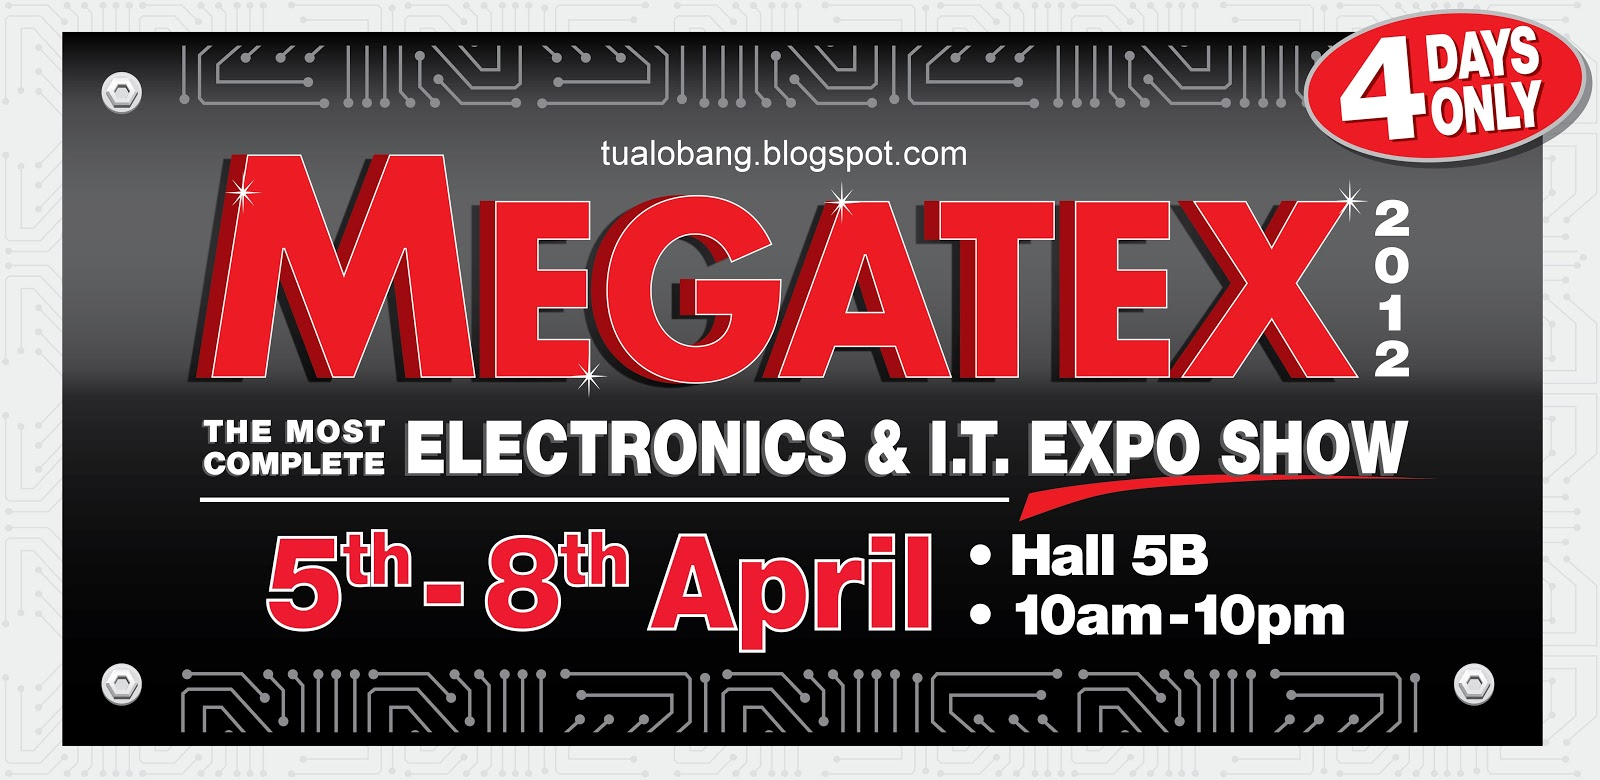 Tua Lobang Megatex 2012 The Most Complete Electronics